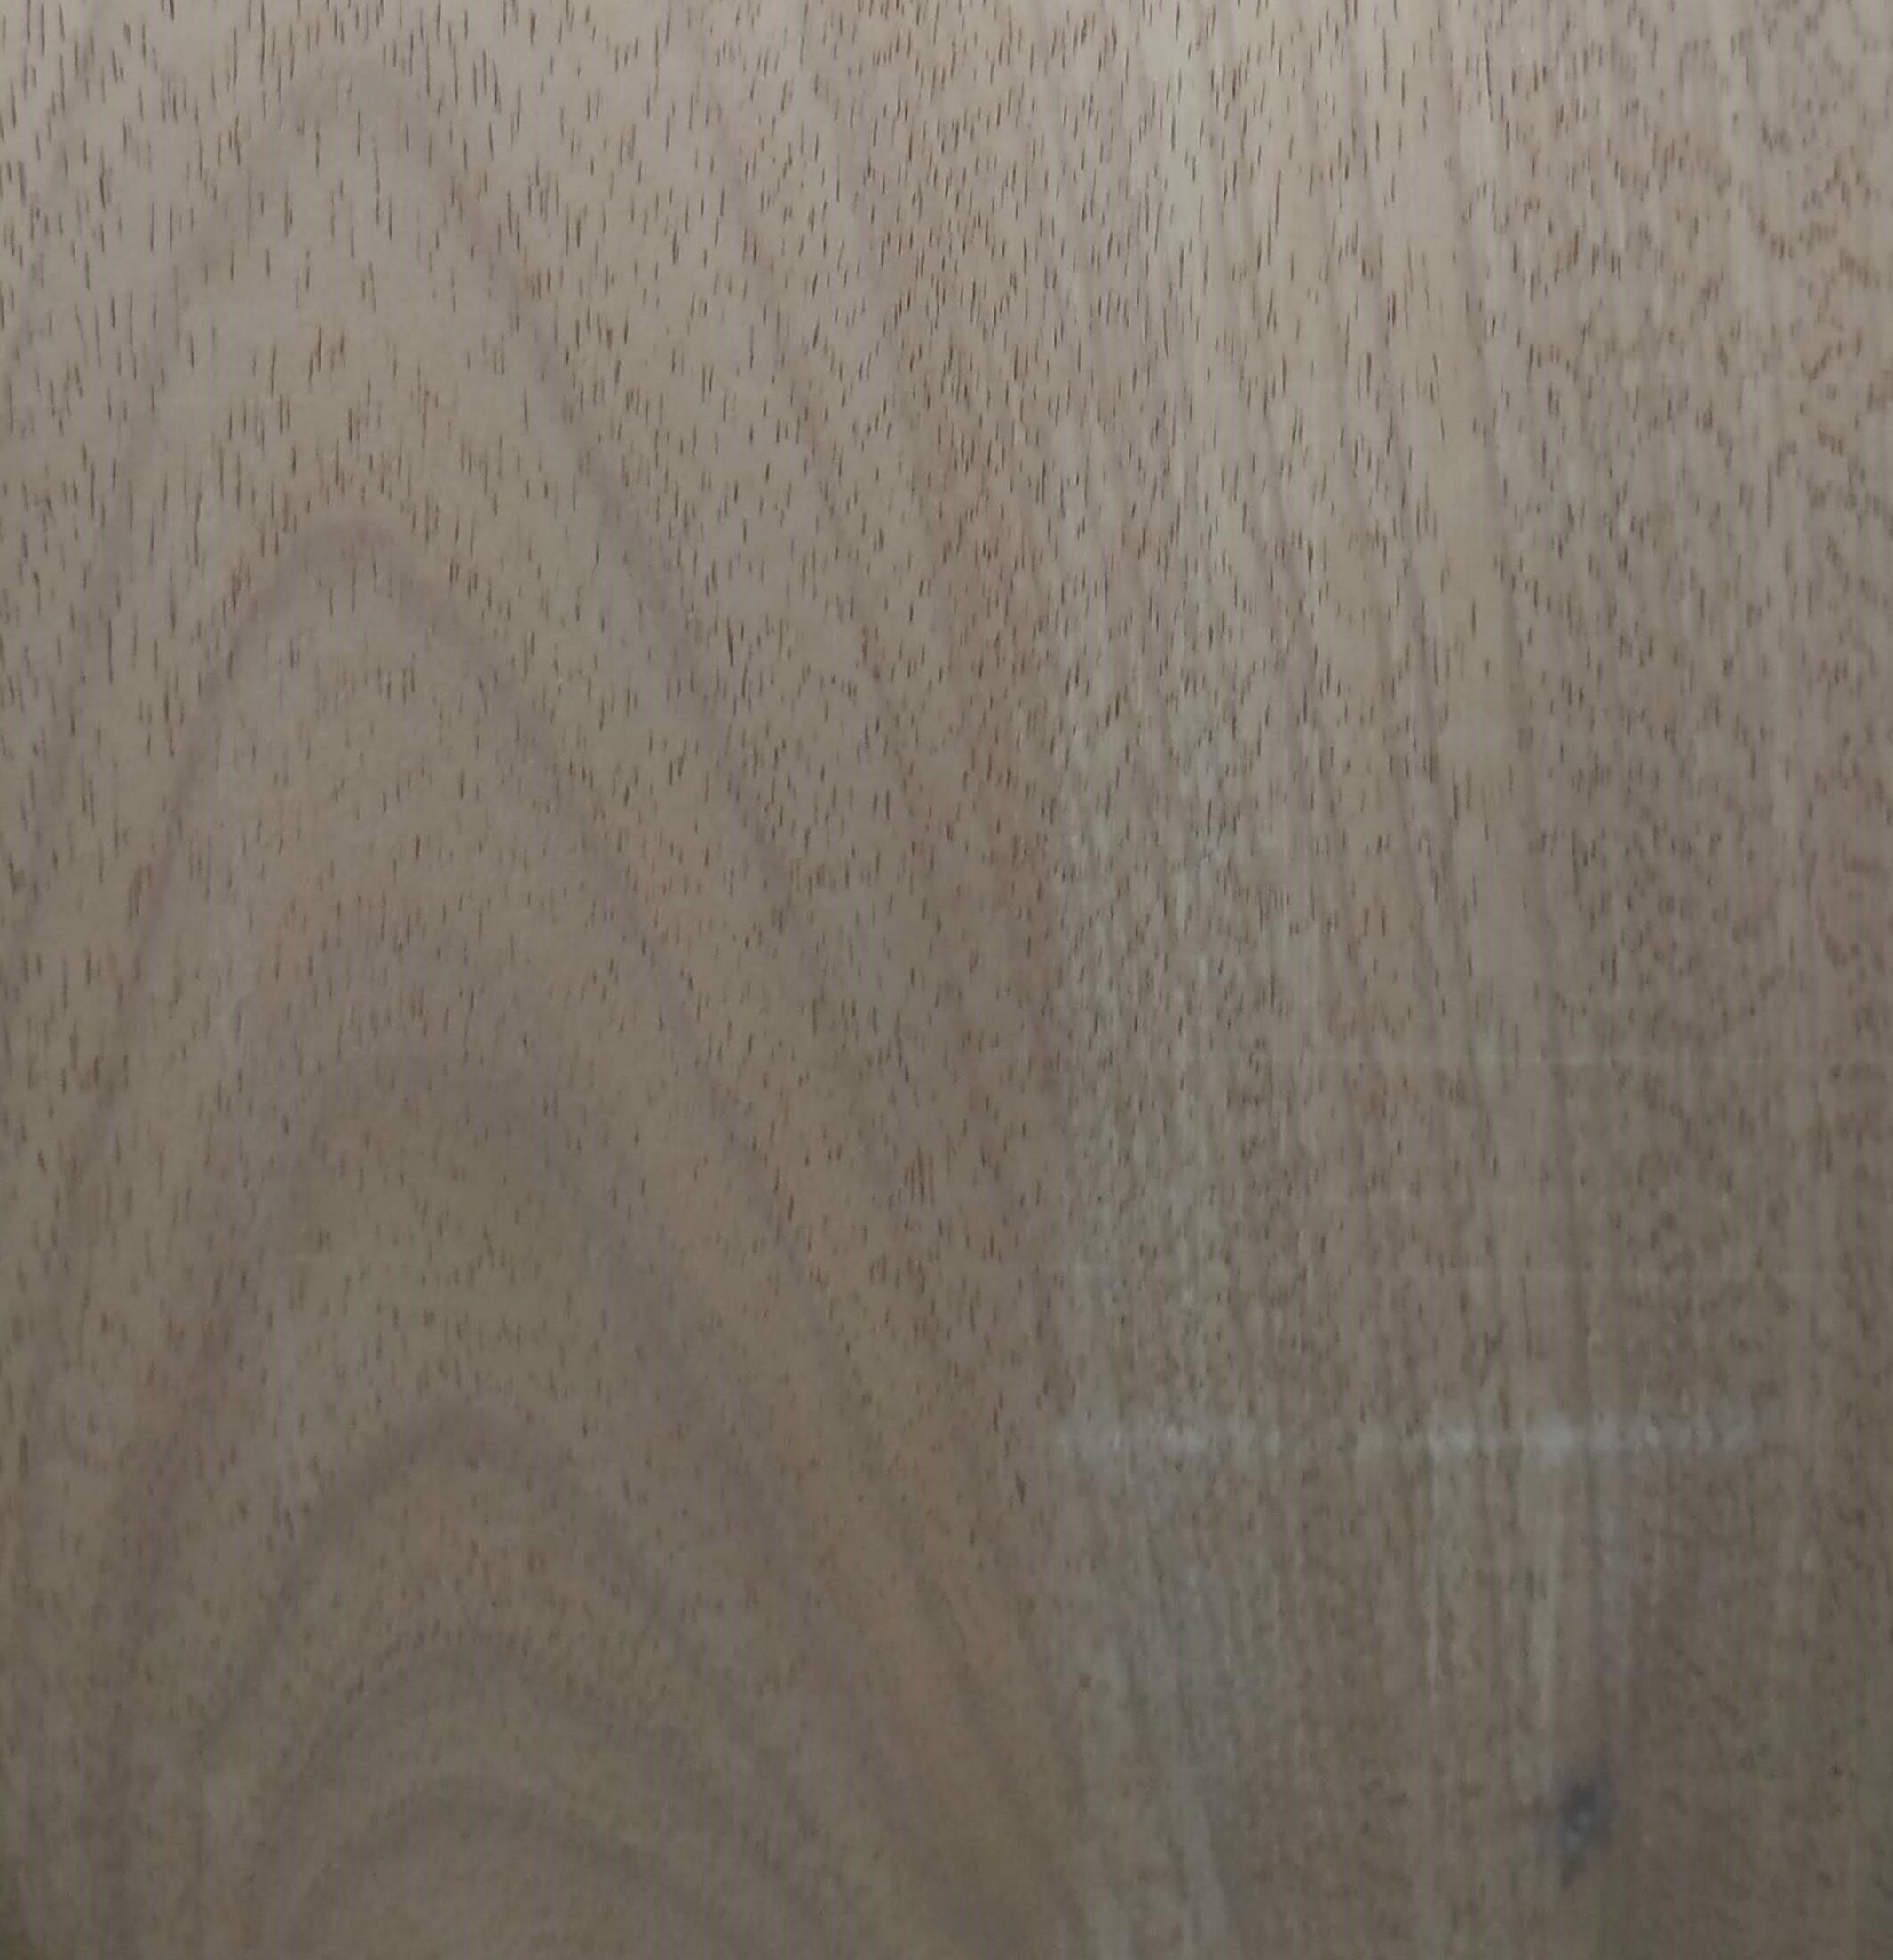 Imagen FILO MAD.PREENG XROLLO 10MT/CEDRO/22 PREENG